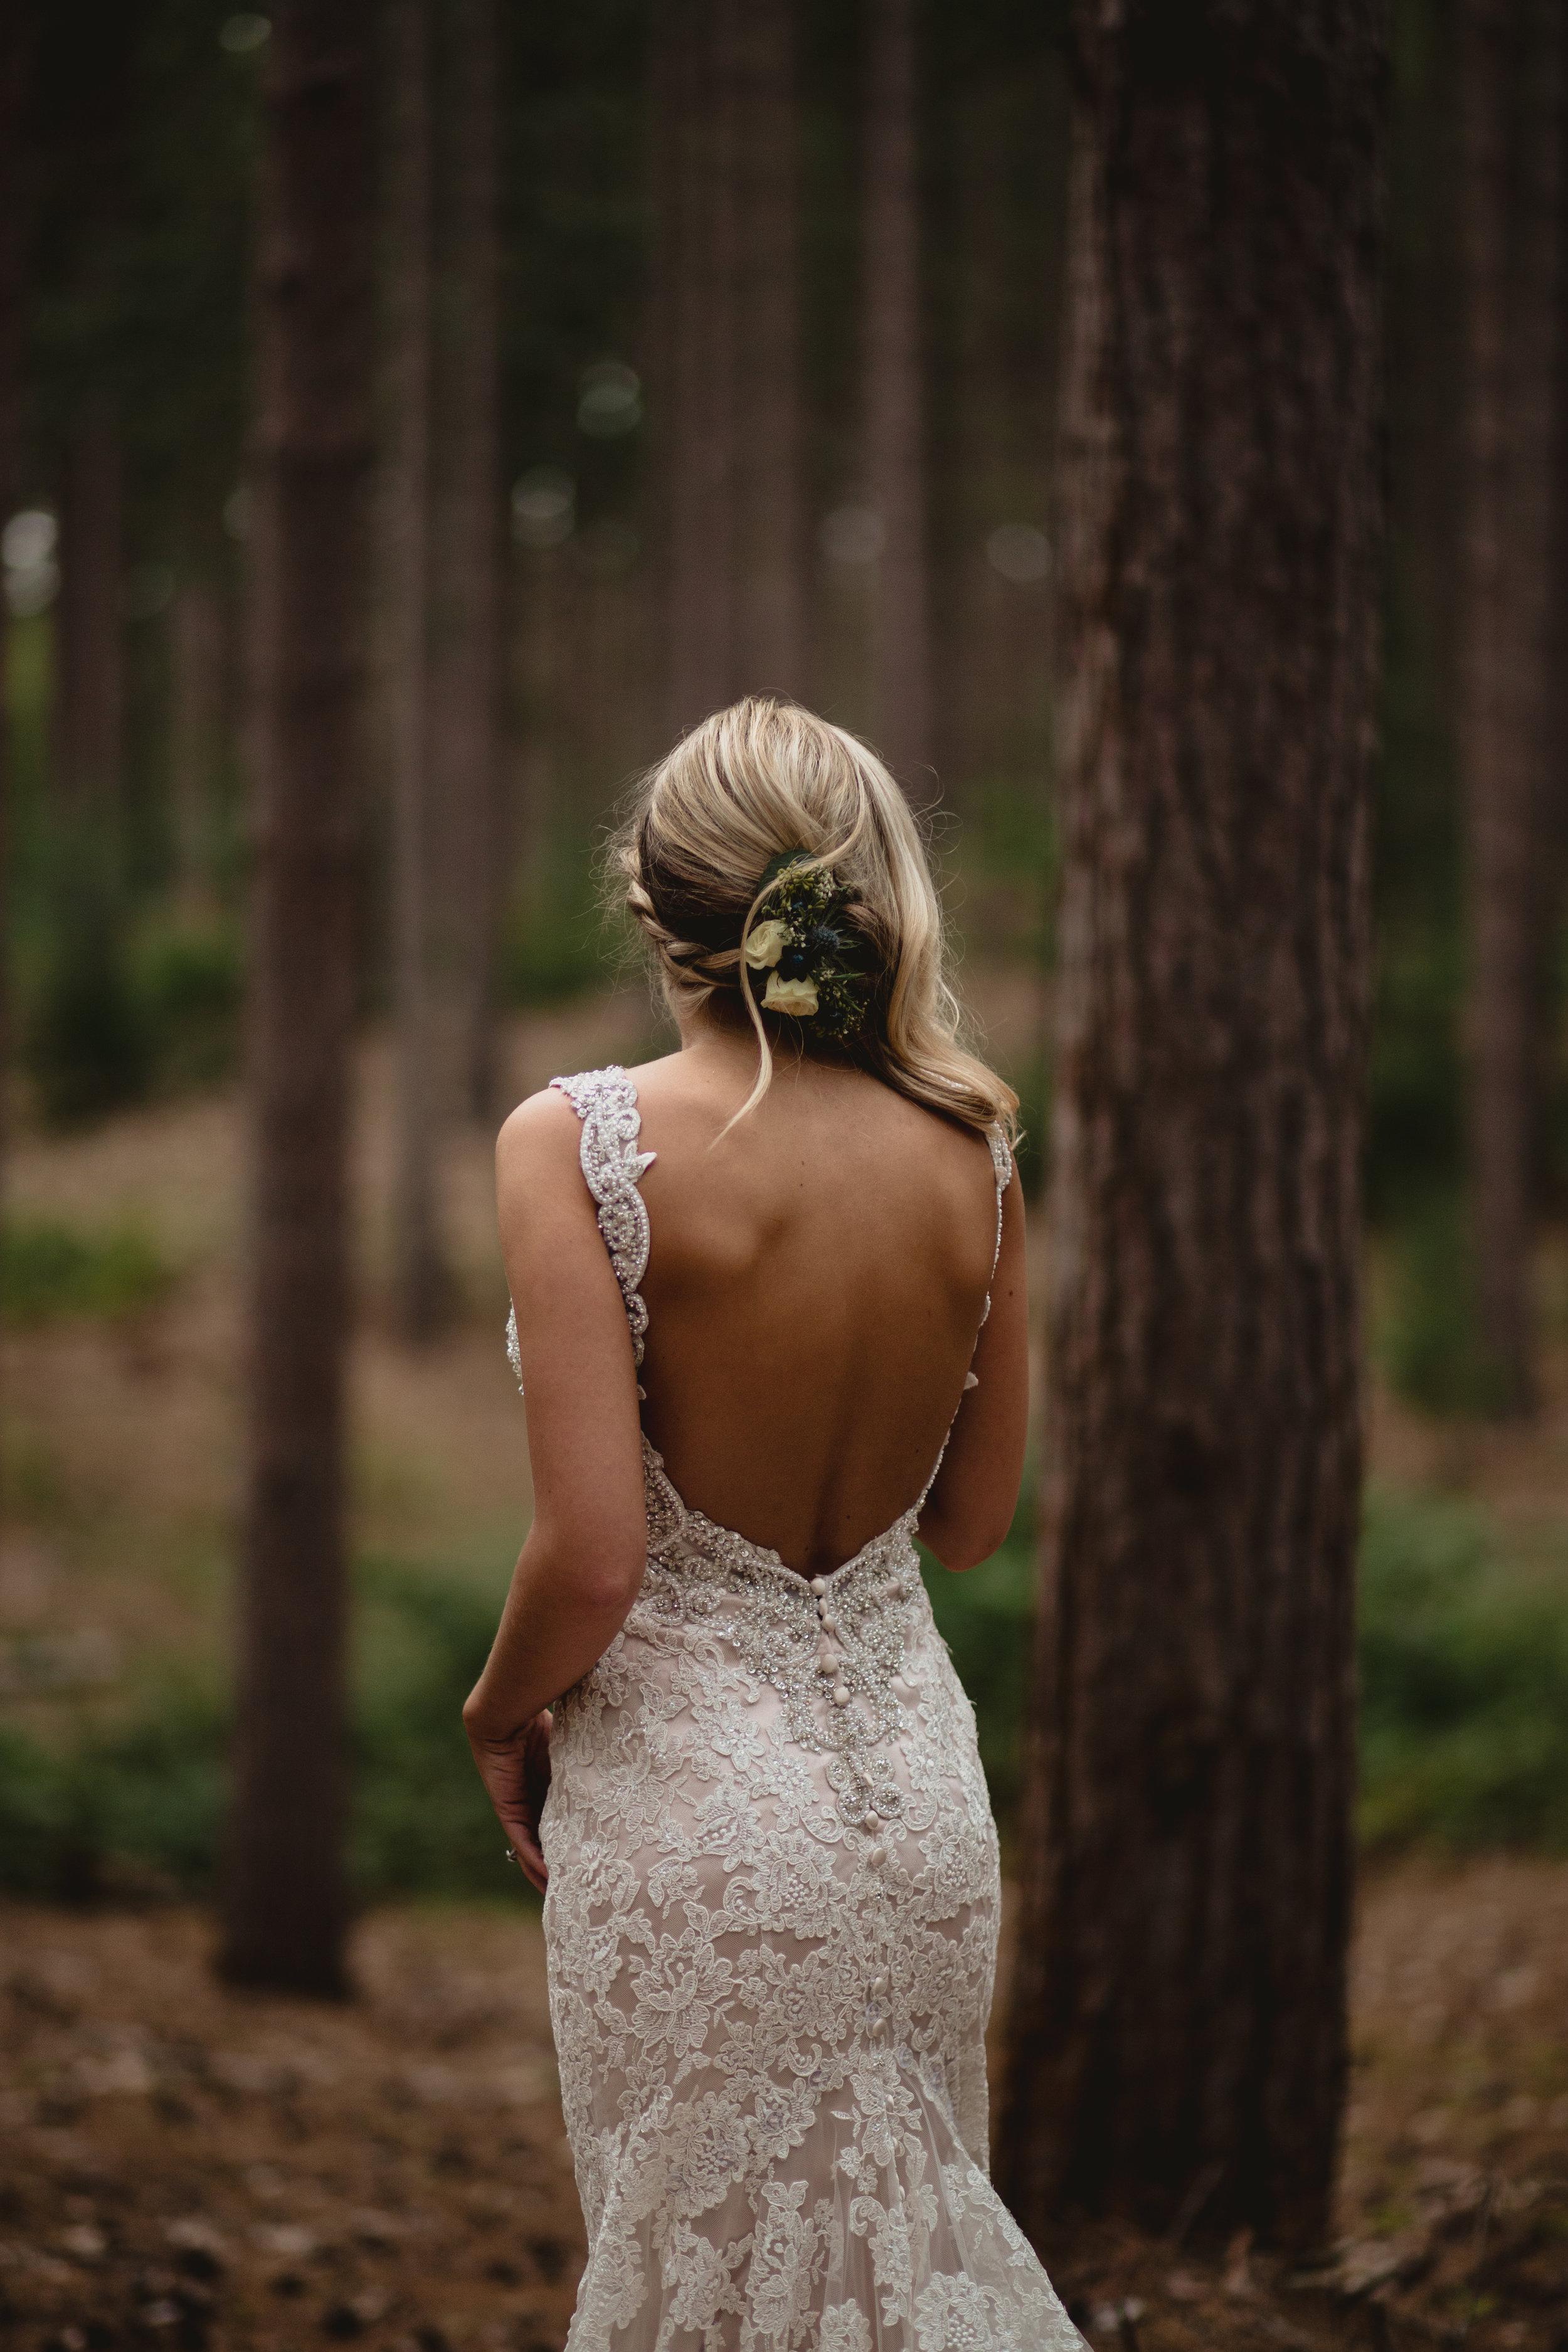 west-michigan-wedding-photographer-whitehall-rachel-austin-chapel-in-the-pines-381.jpg